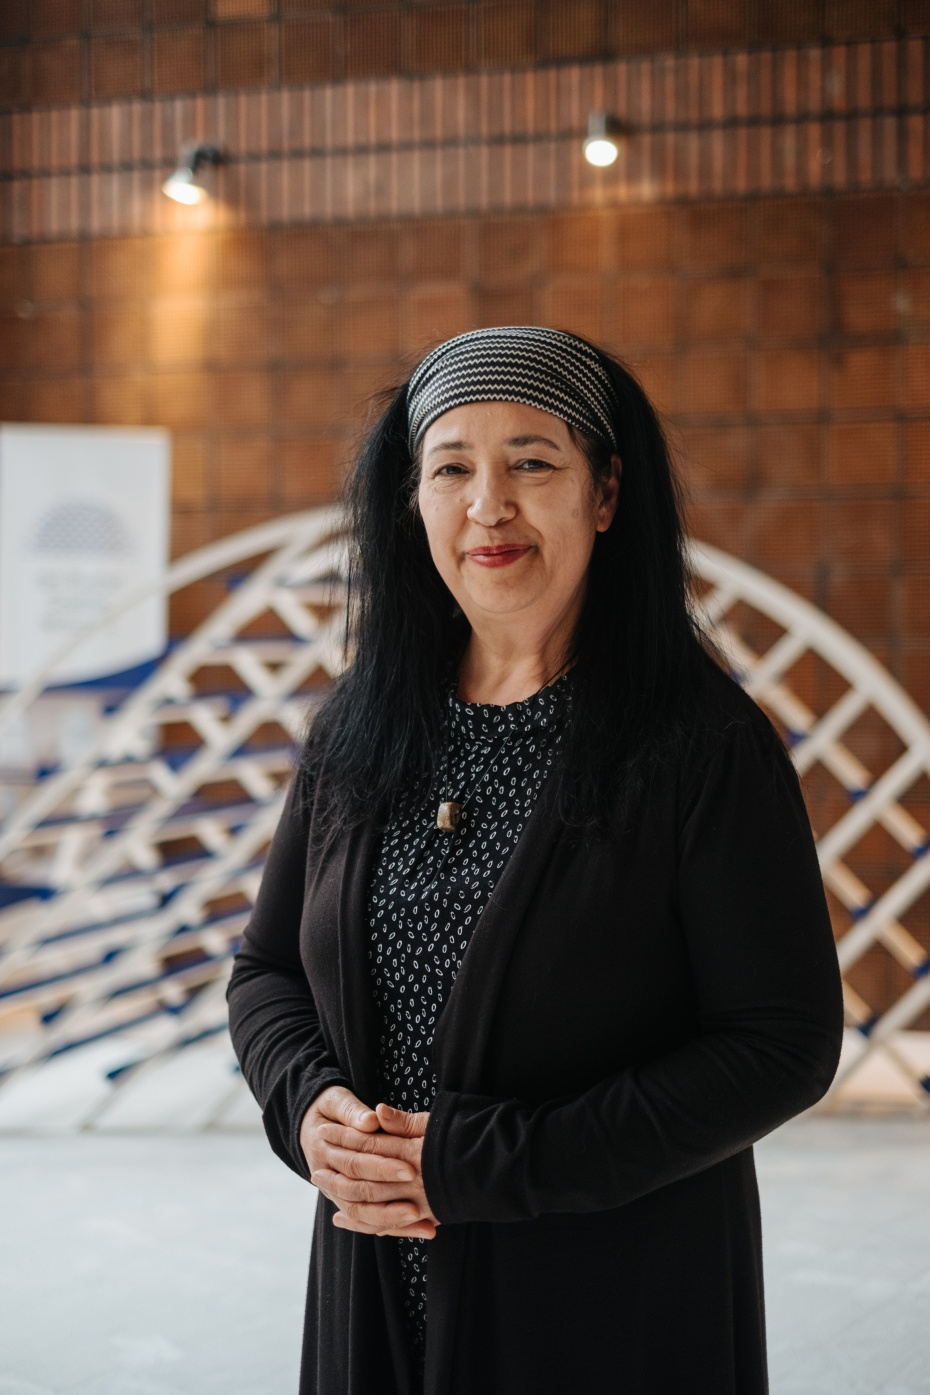 Seyran Ateş, Gründerin der liberalen Ibn Rushd-Goethe Moschee in Berlin